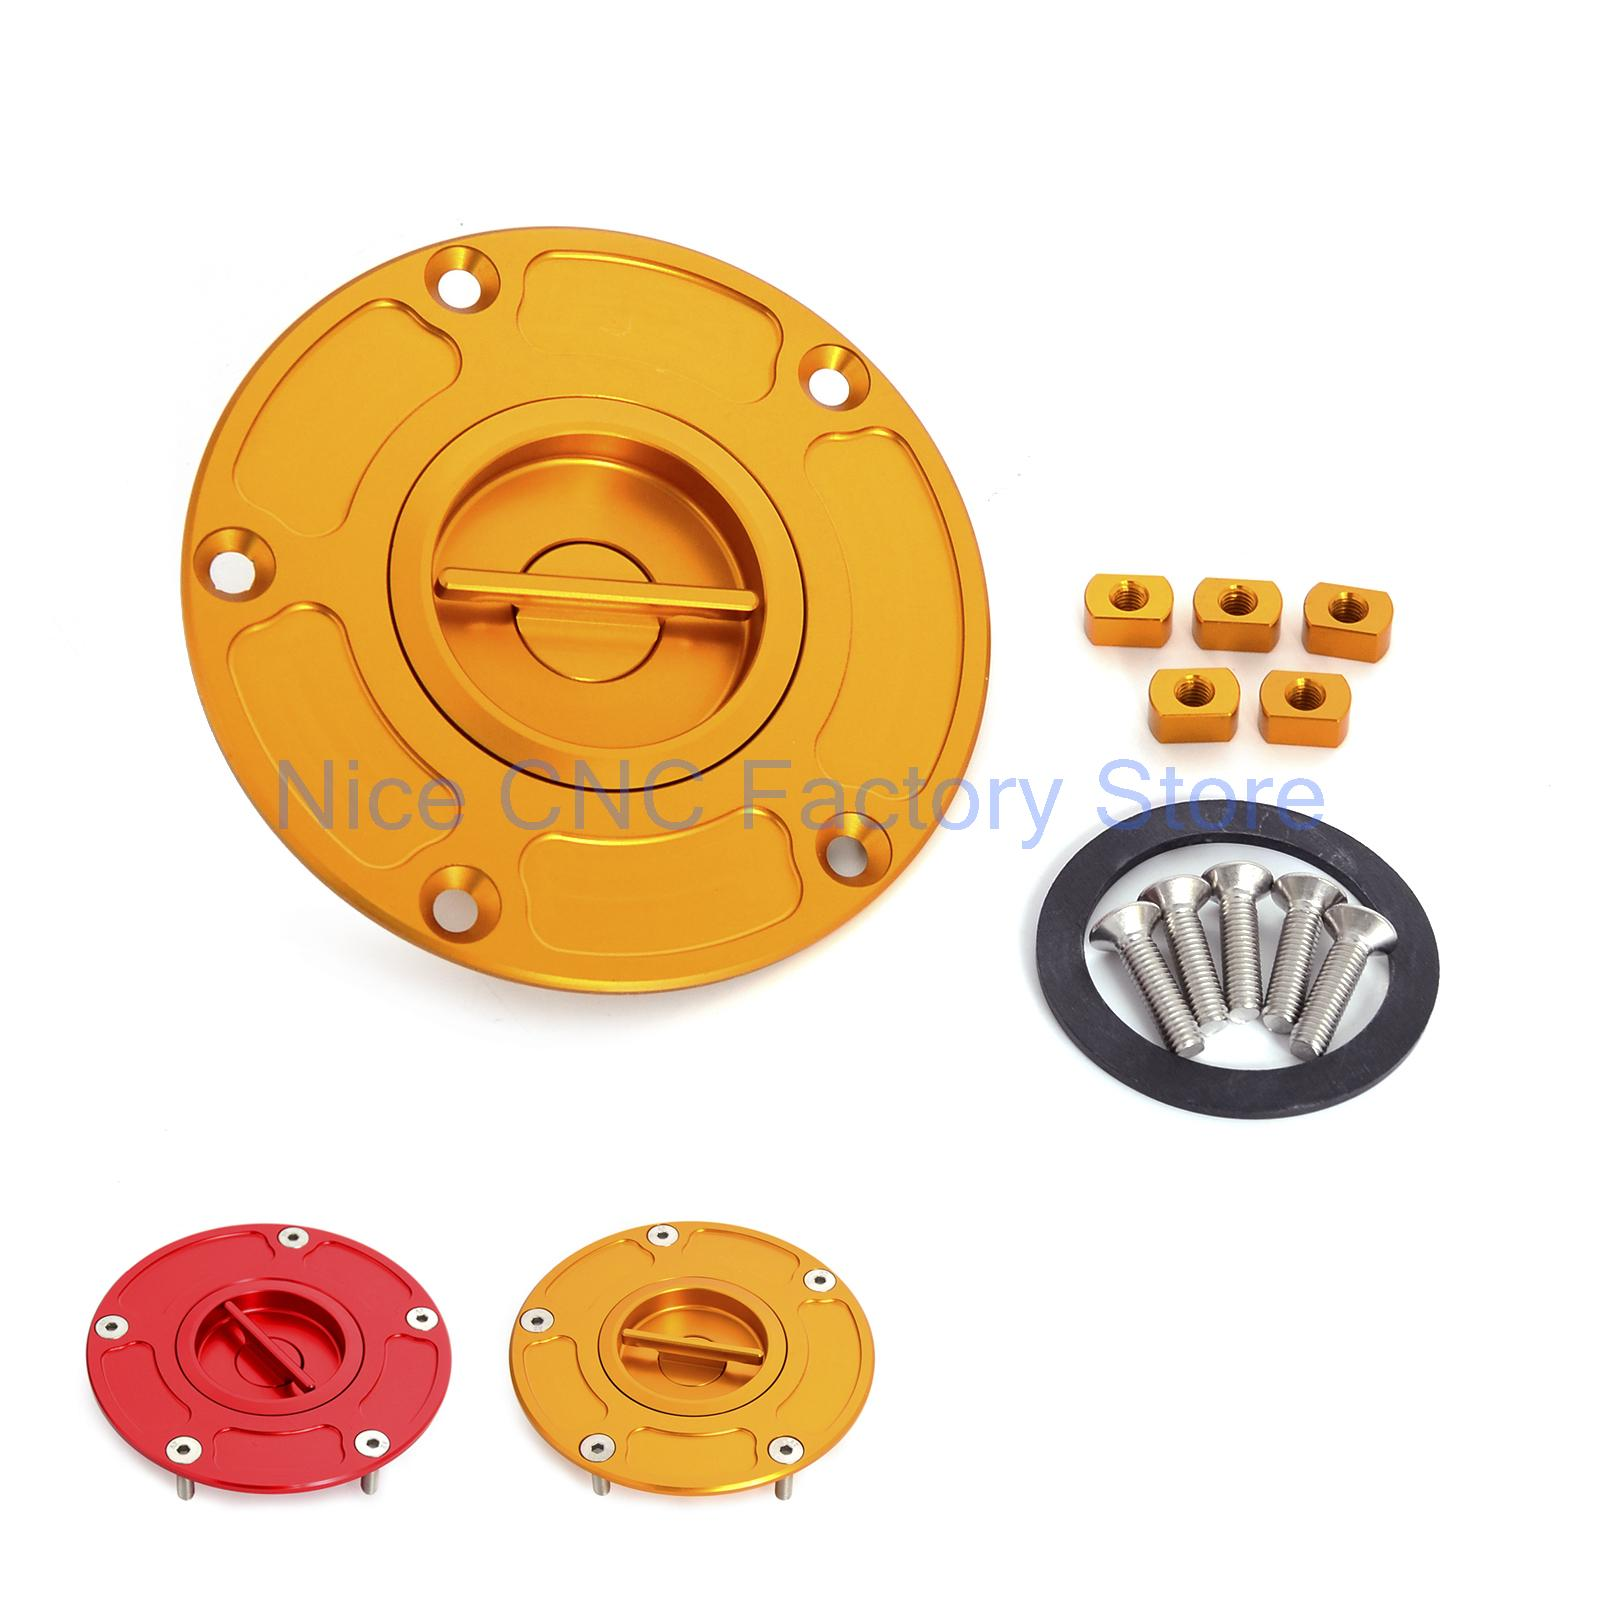 ФОТО Billet CNC Keyless Fuel Gas Cap For DUCATI 899/959/1199/1199S/1199R